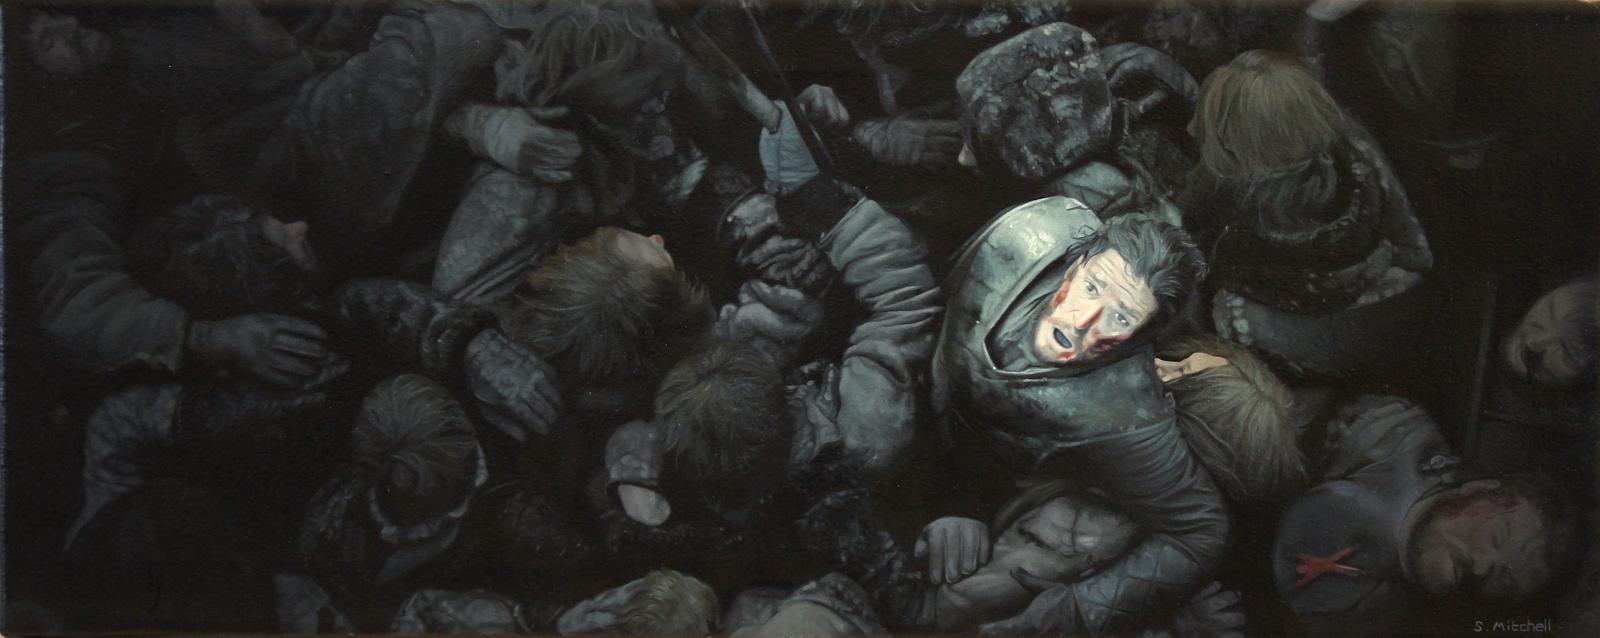 Battle of the Bastards by Scott Mitchell